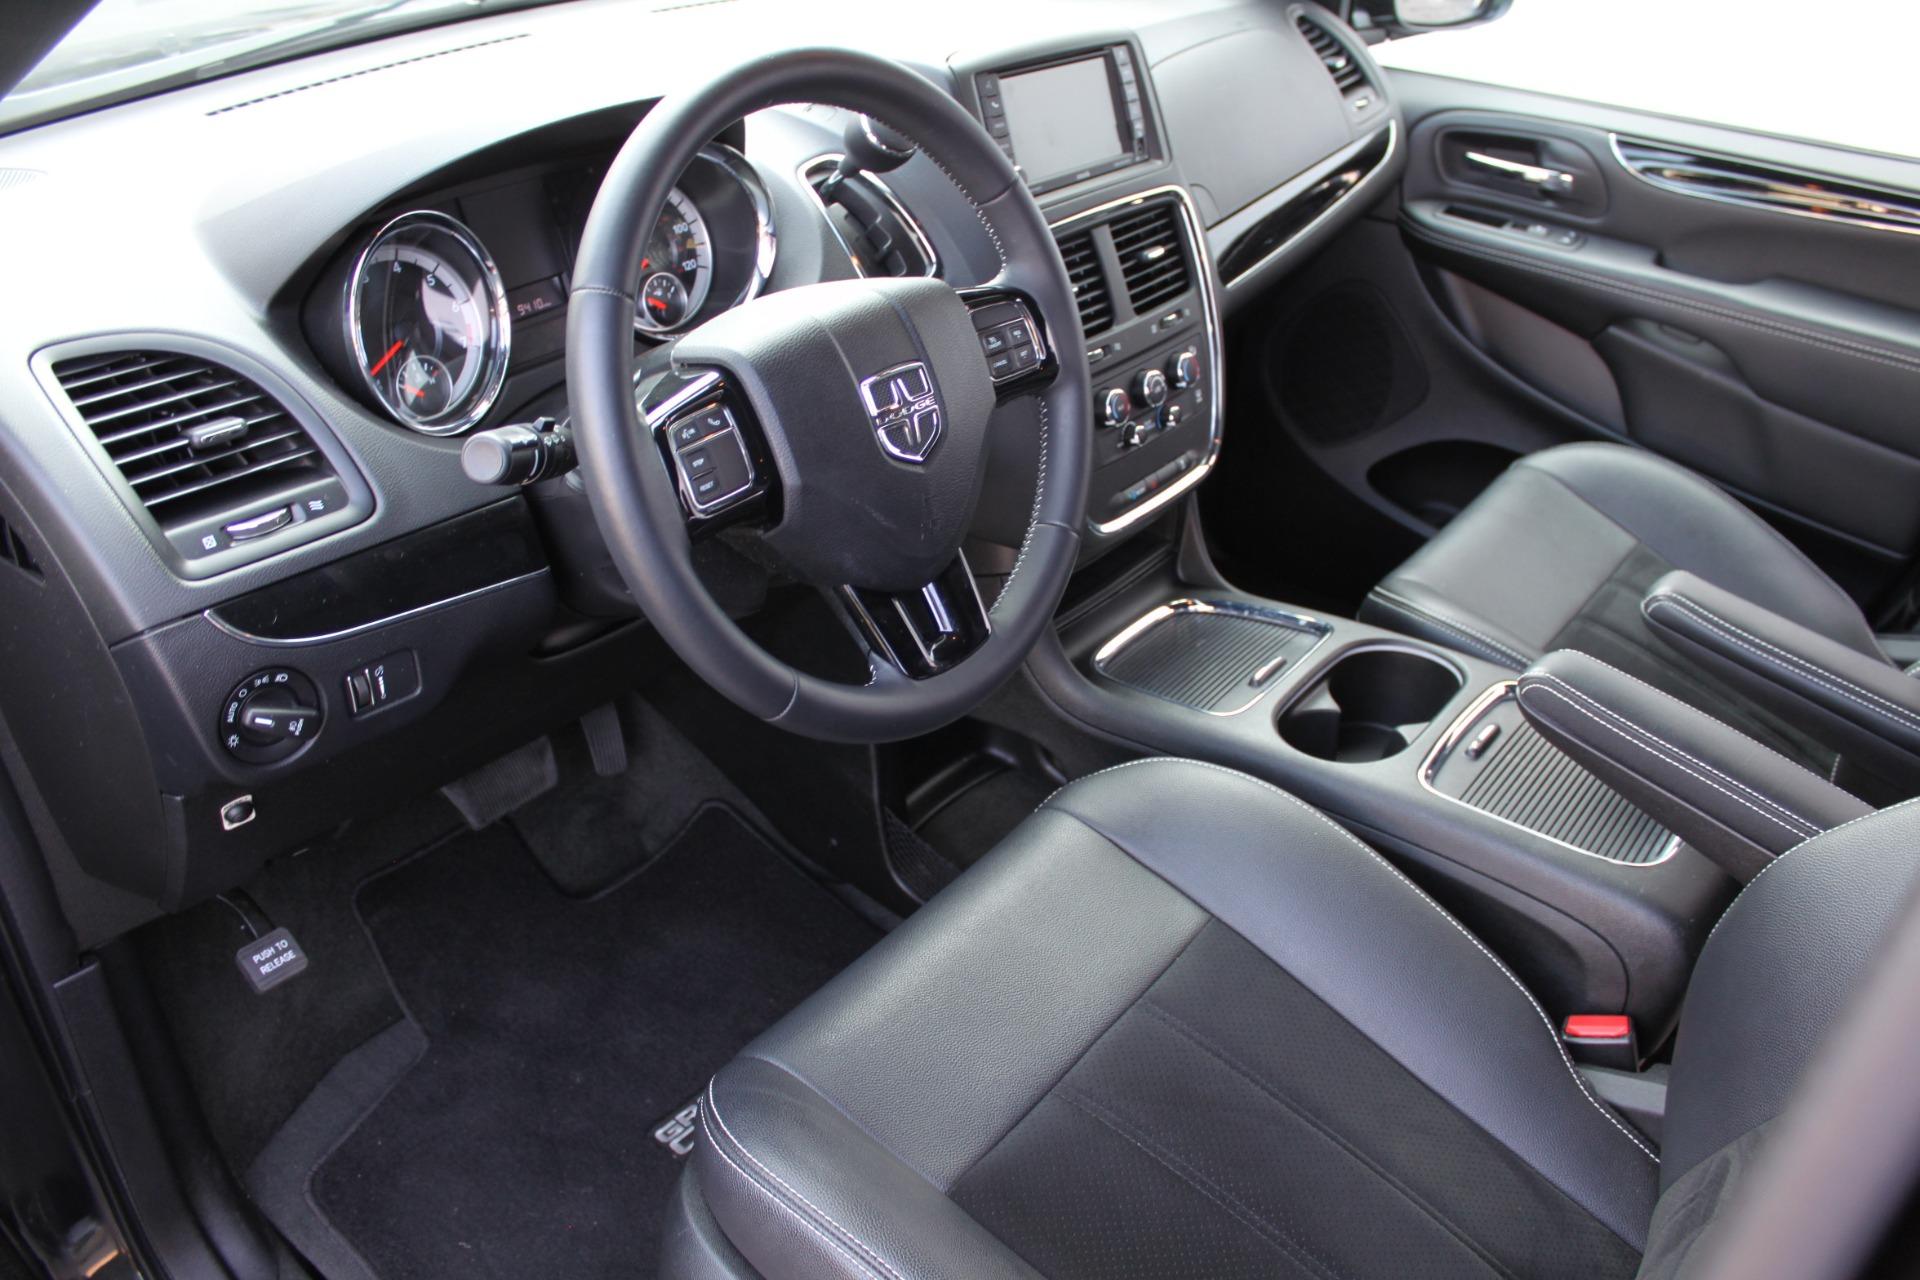 Used-2018-Dodge-Grand-Caravan-SXT-Rollx-Mobility-Conversion-Collector